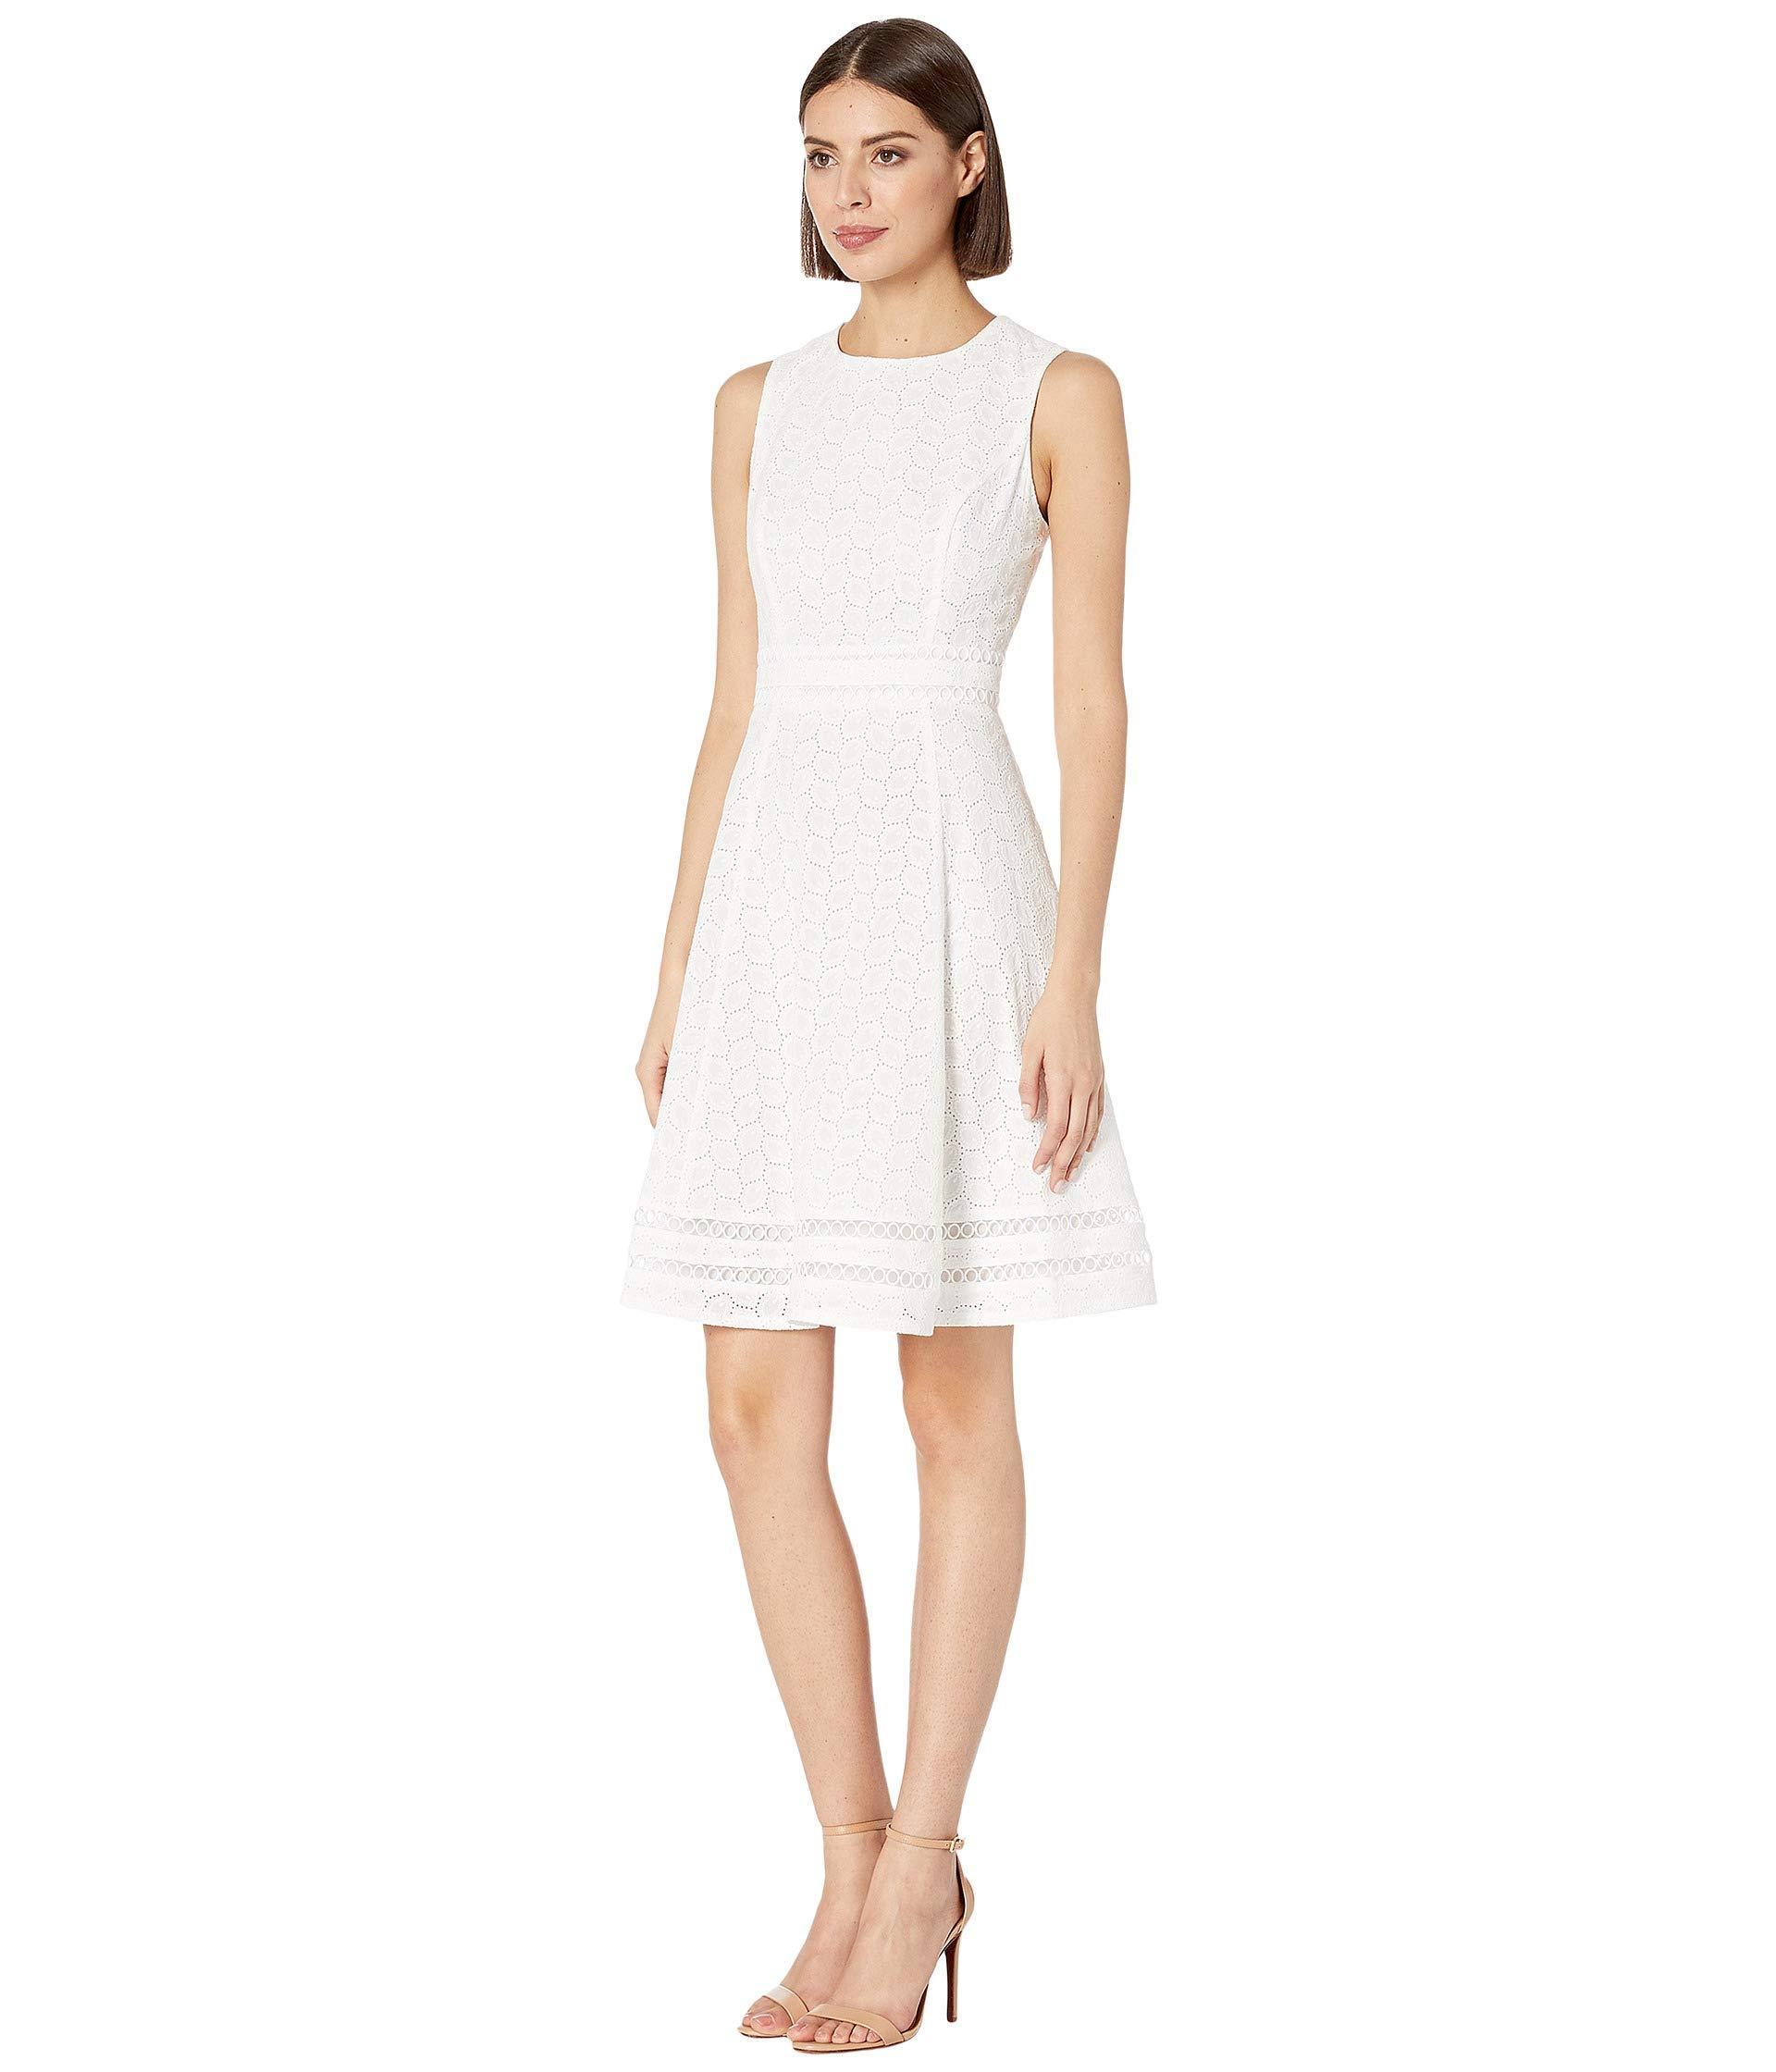 8a64f9c8cb Lyst - Calvin Klein Cotton Eyelet A-line Dress (white) Women s Dress in  White